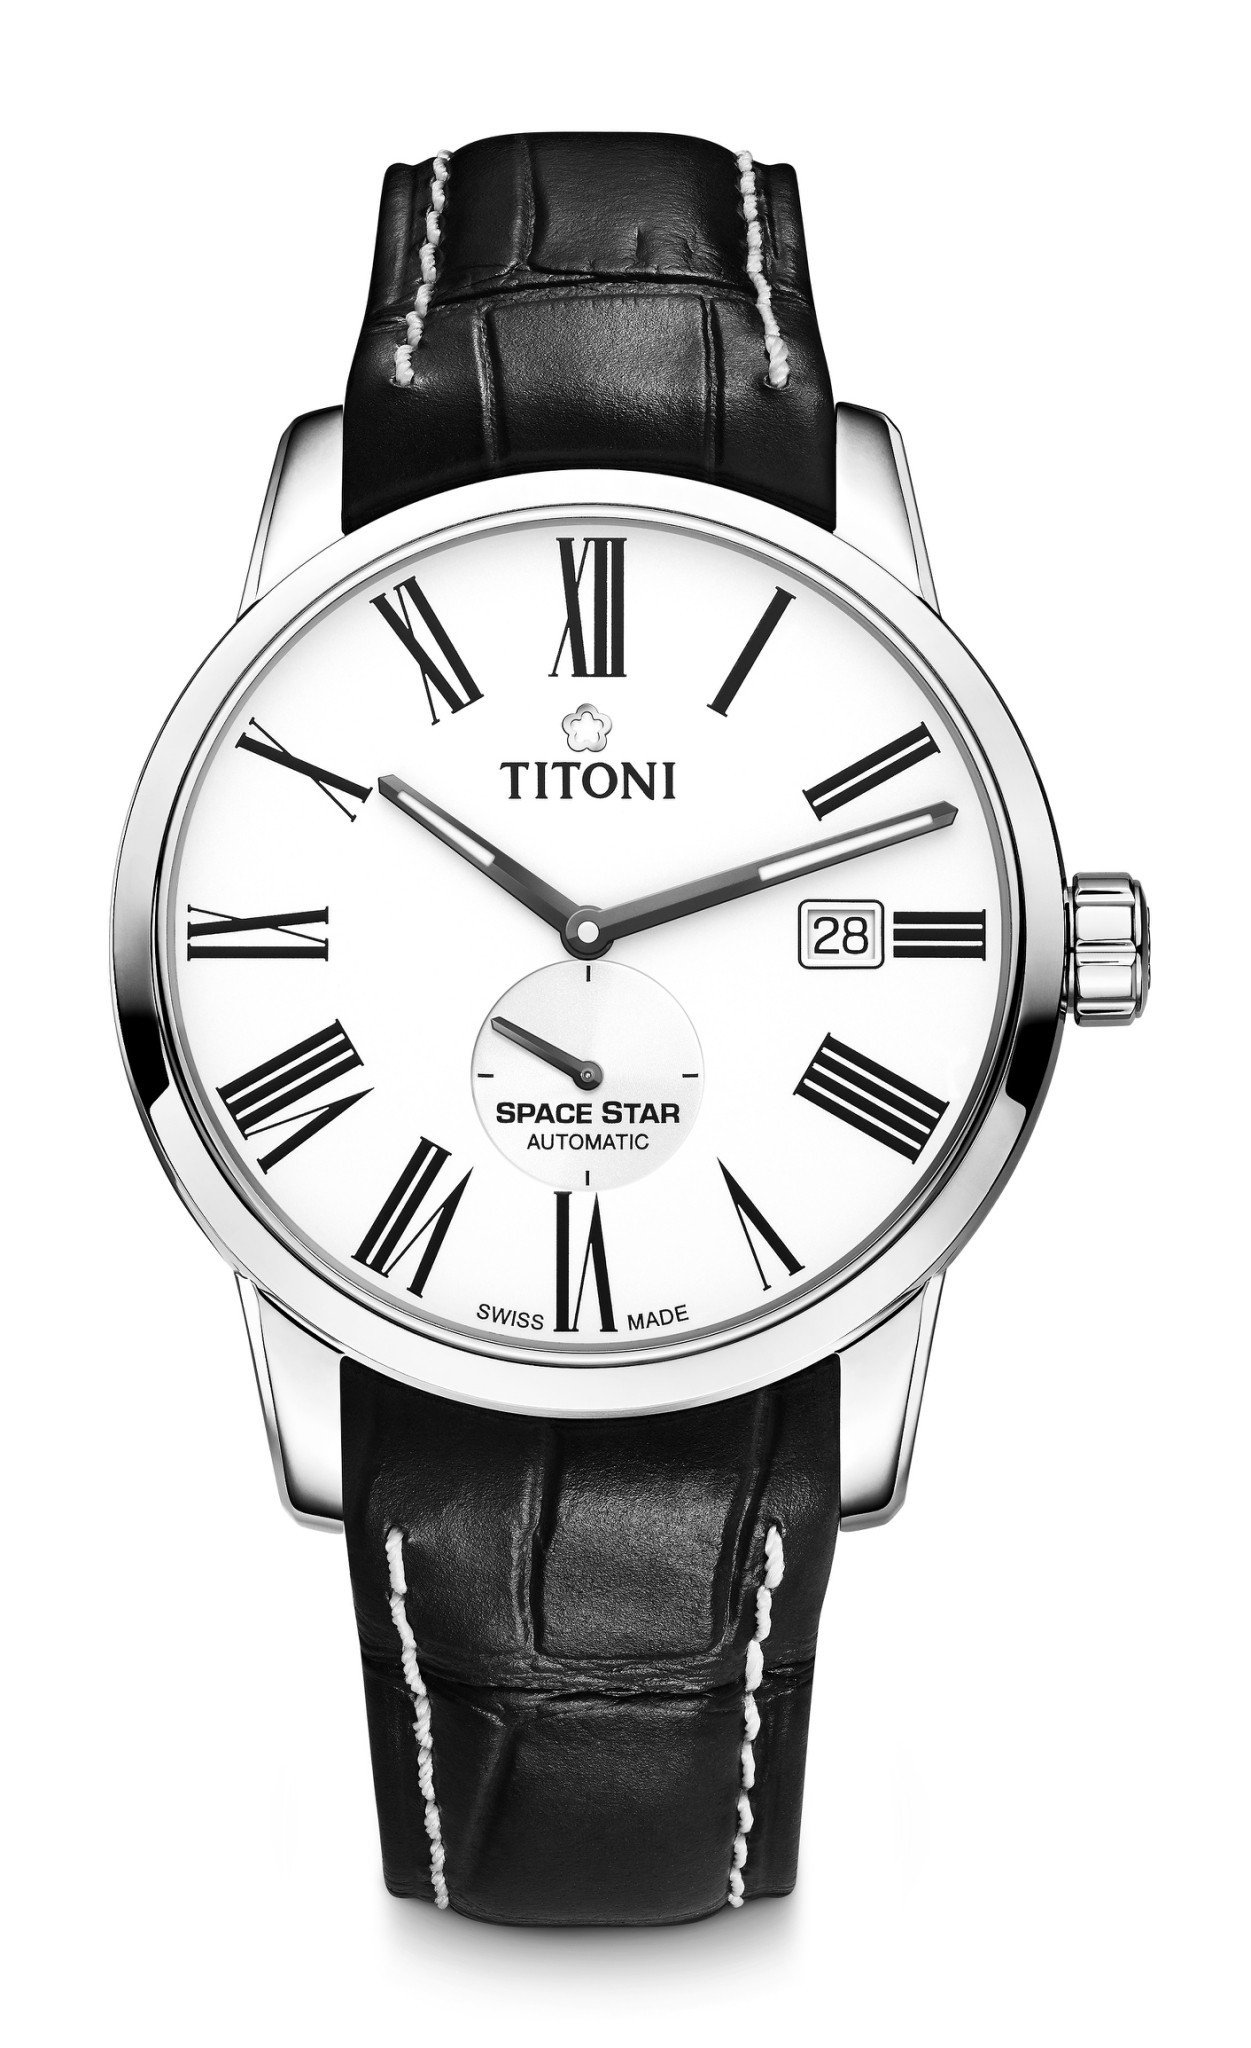 TITONI 梅花表 天星系列皮革表帶款,39,900元。圖/梅花表提供